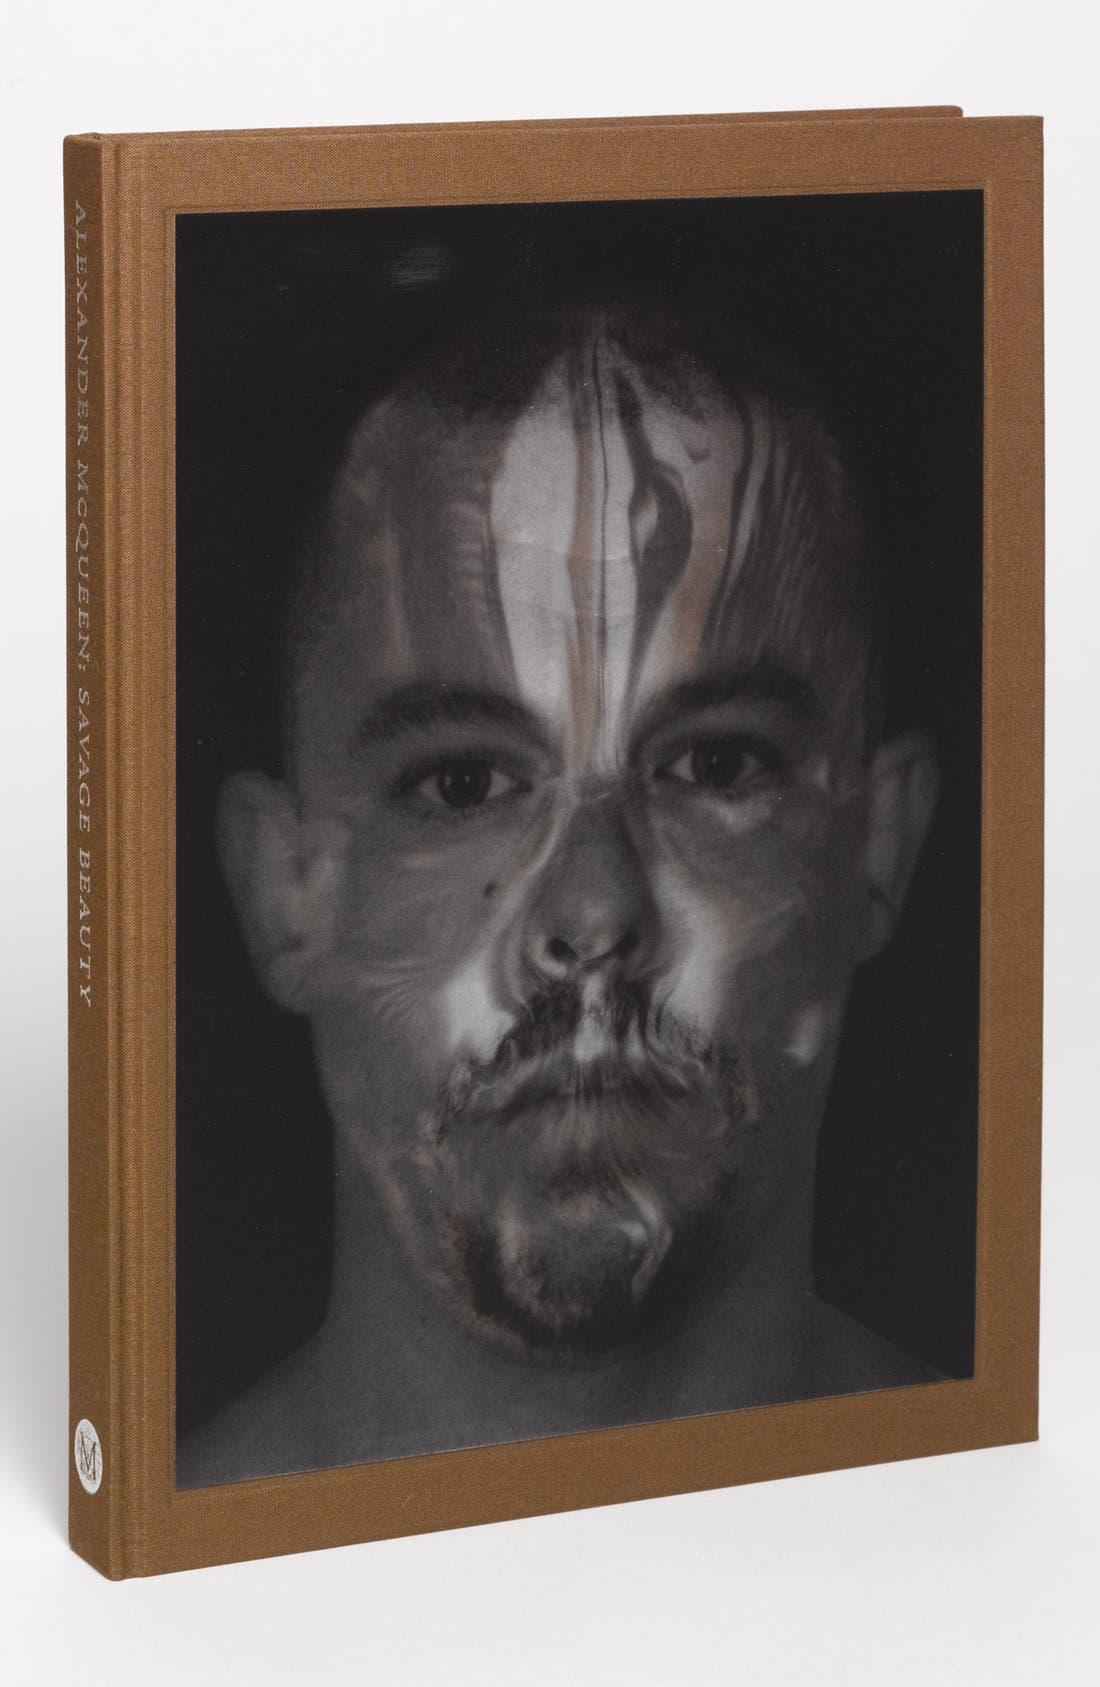 Alternate Image 1 Selected - 'Alexander McQueen: Savage Beauty' Book